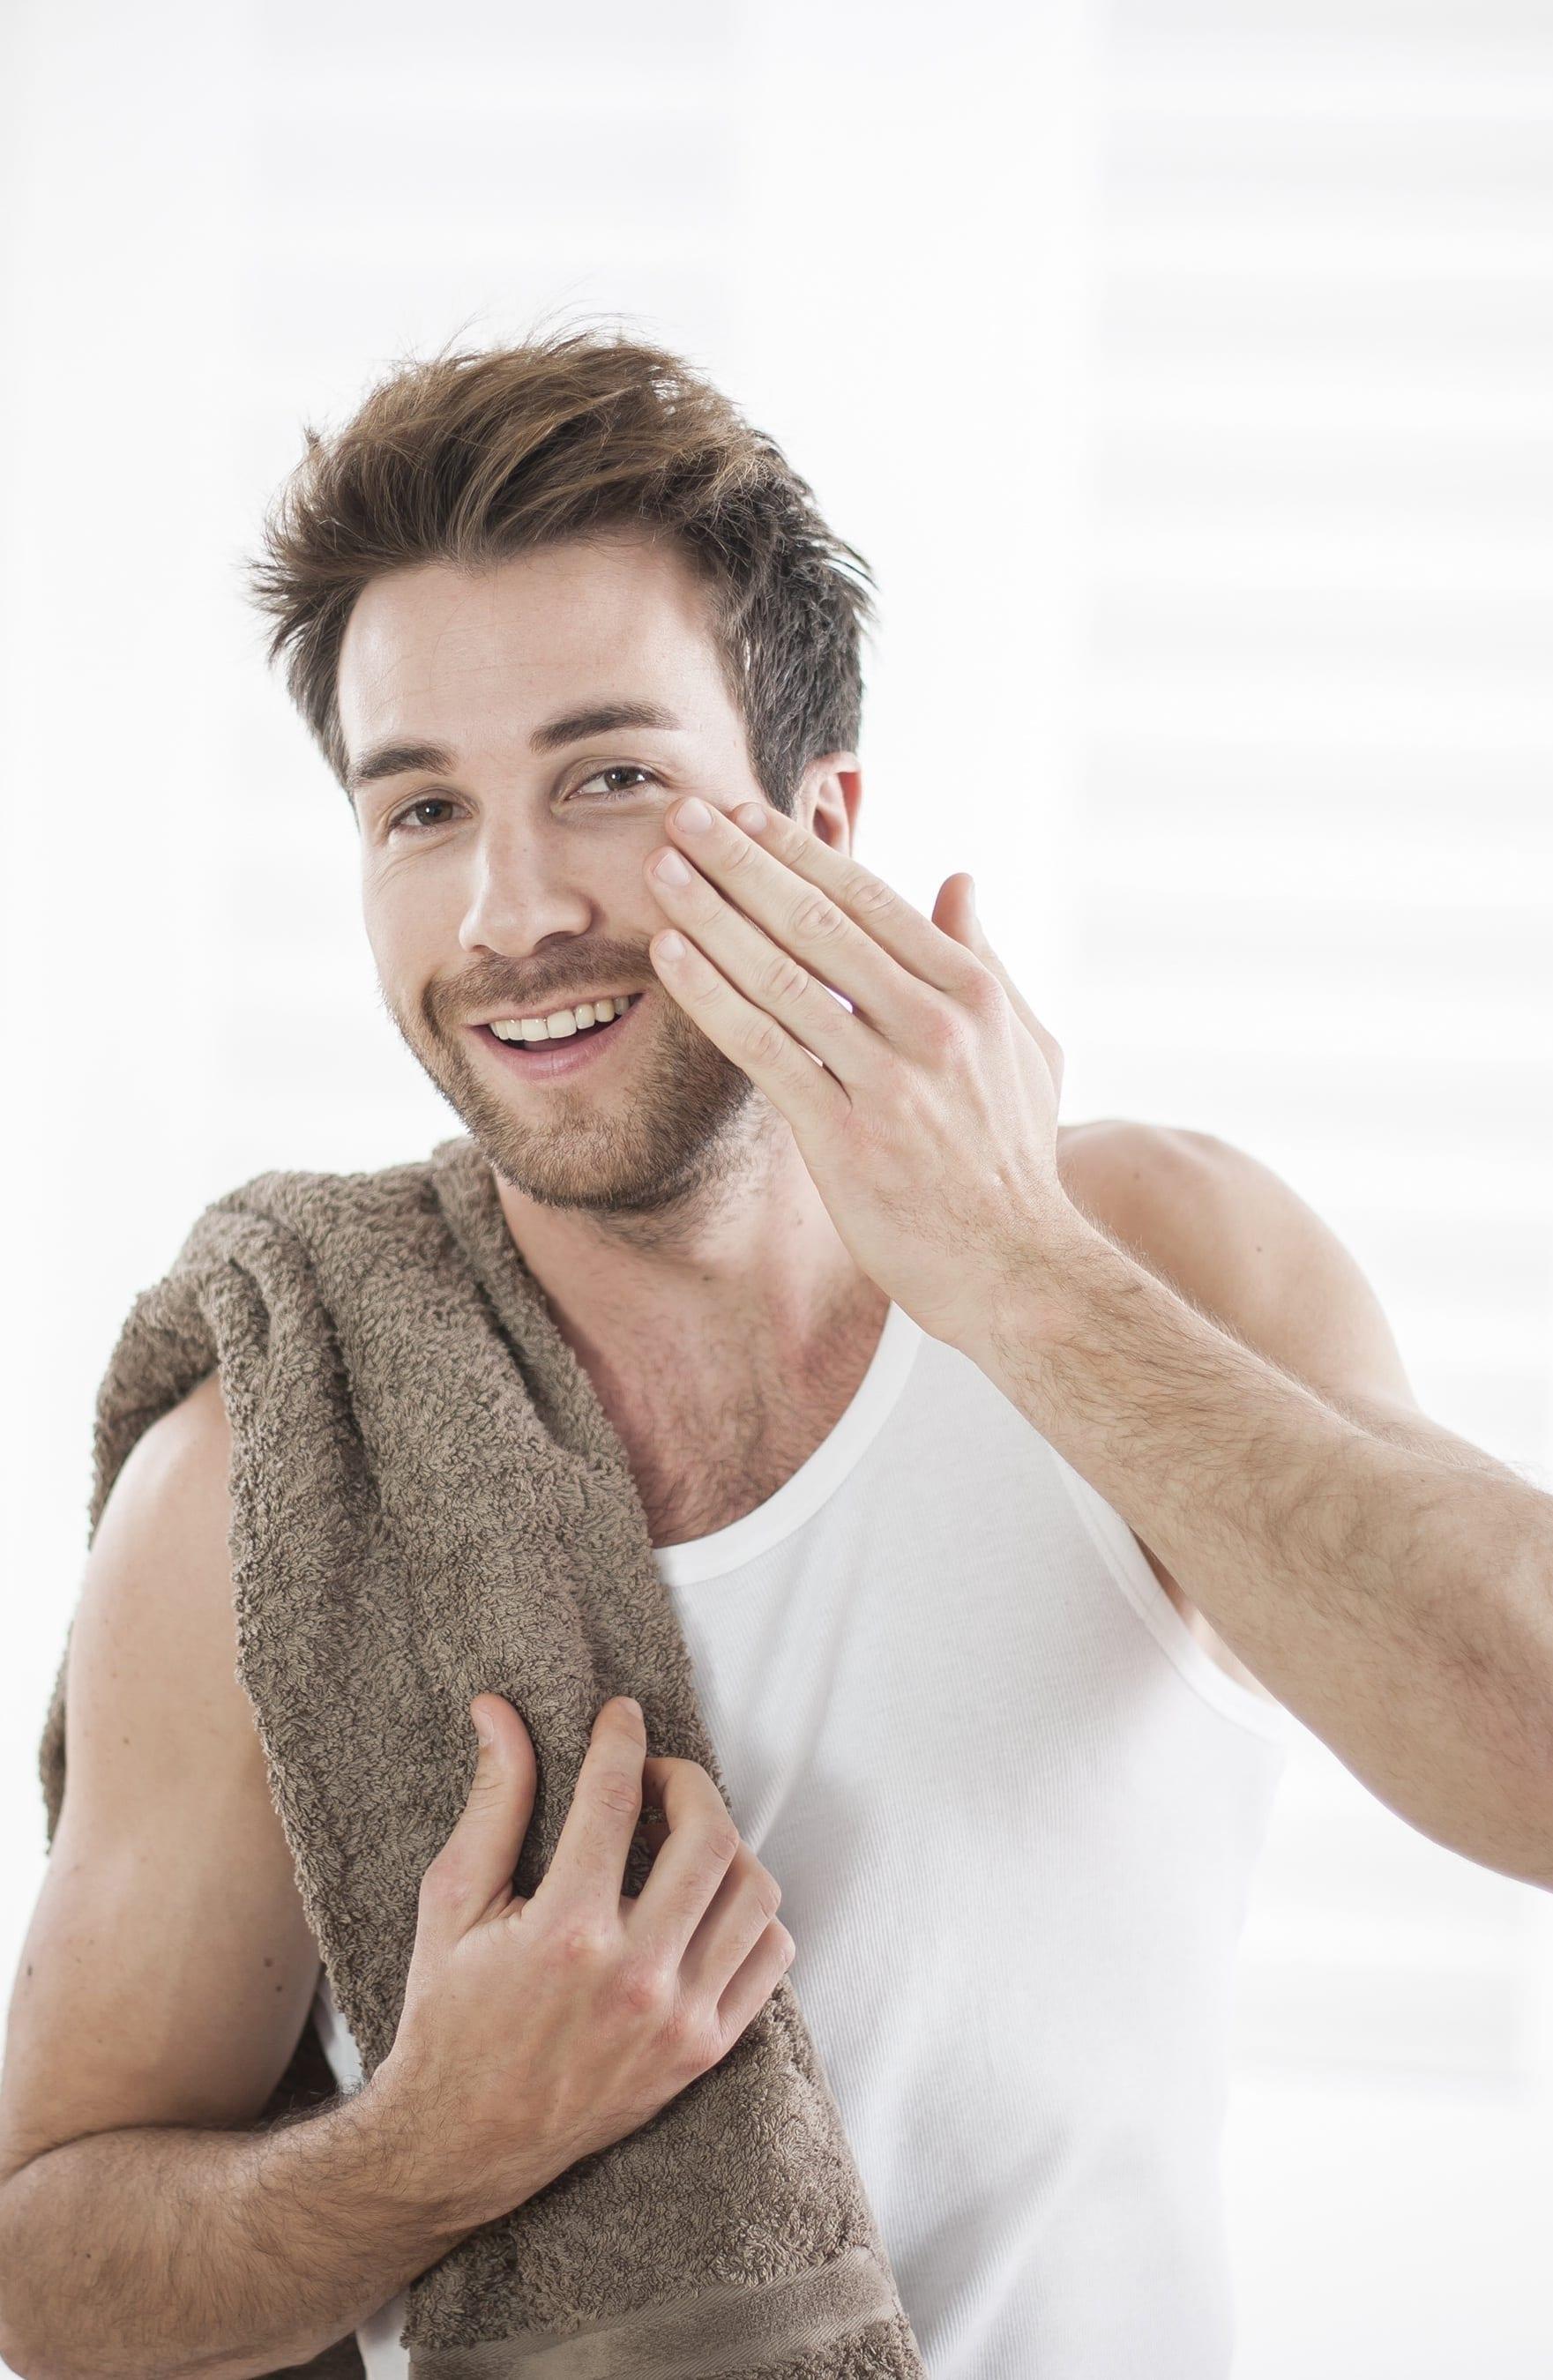 Amazing Skin Care Tips For Men